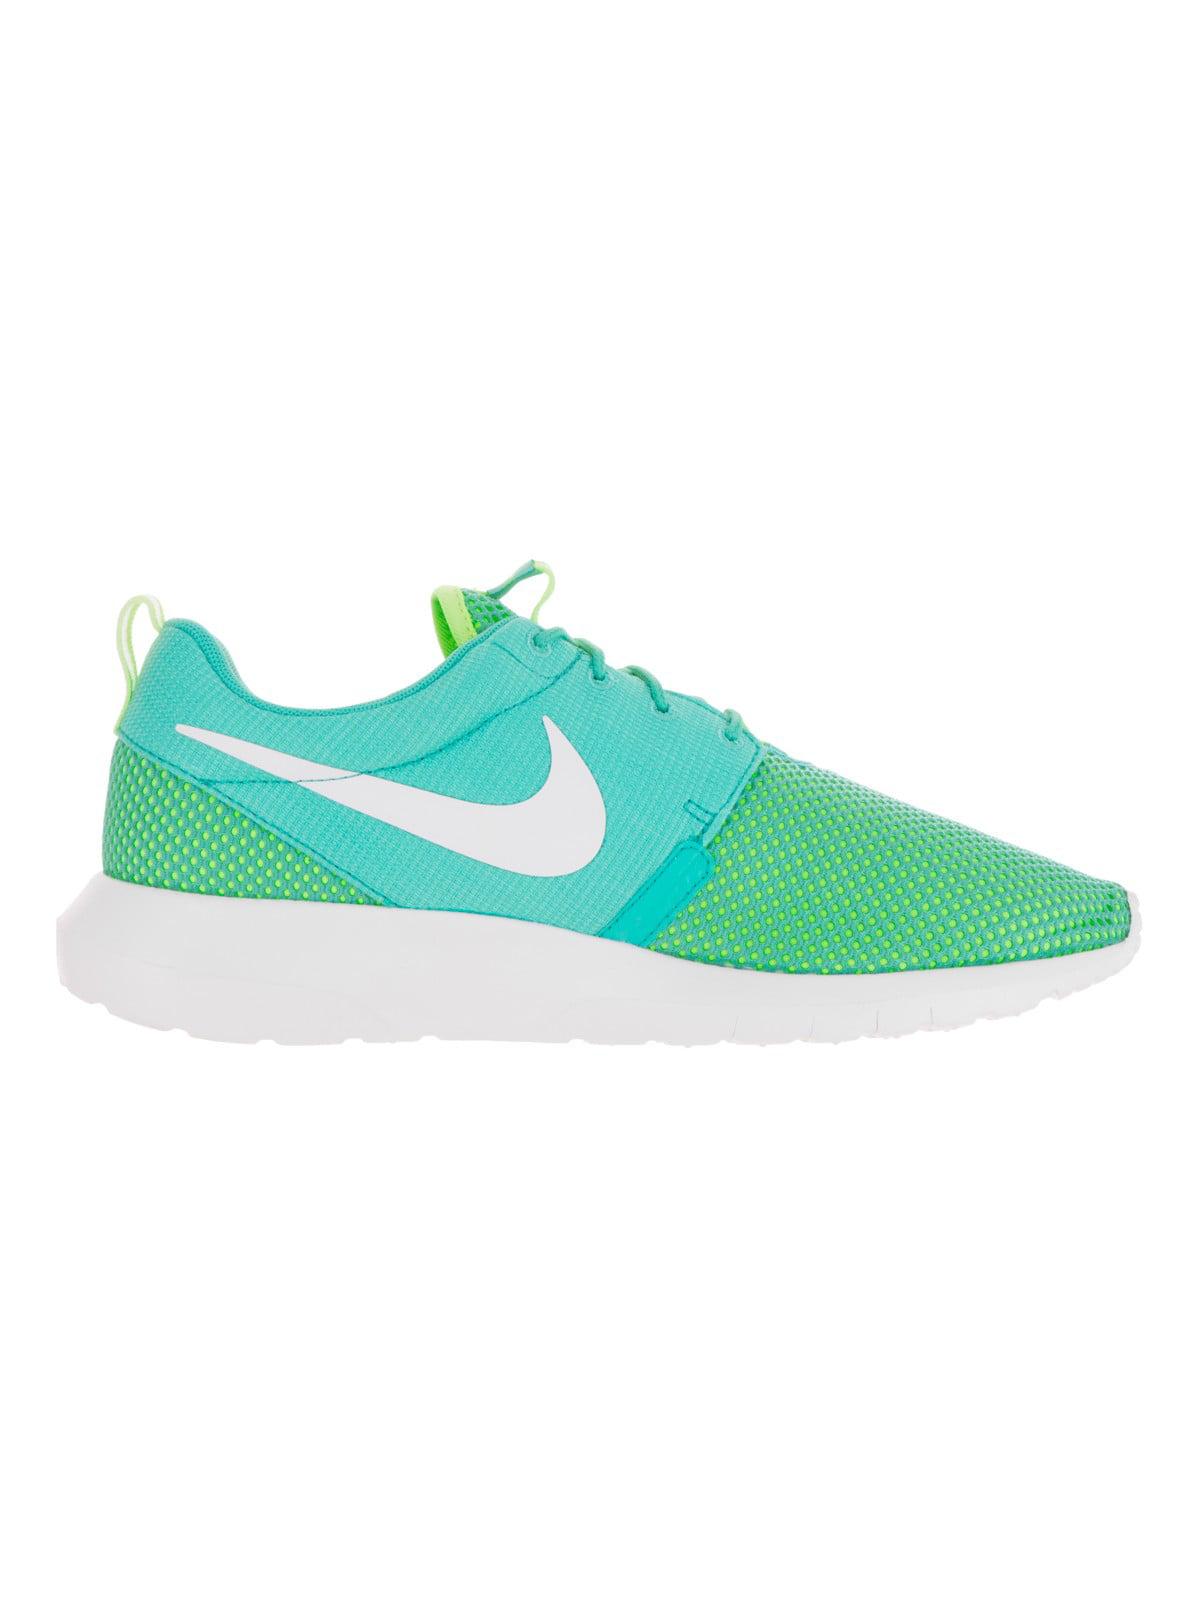 Nike Men's Rosherun Nm Br Running Shoe